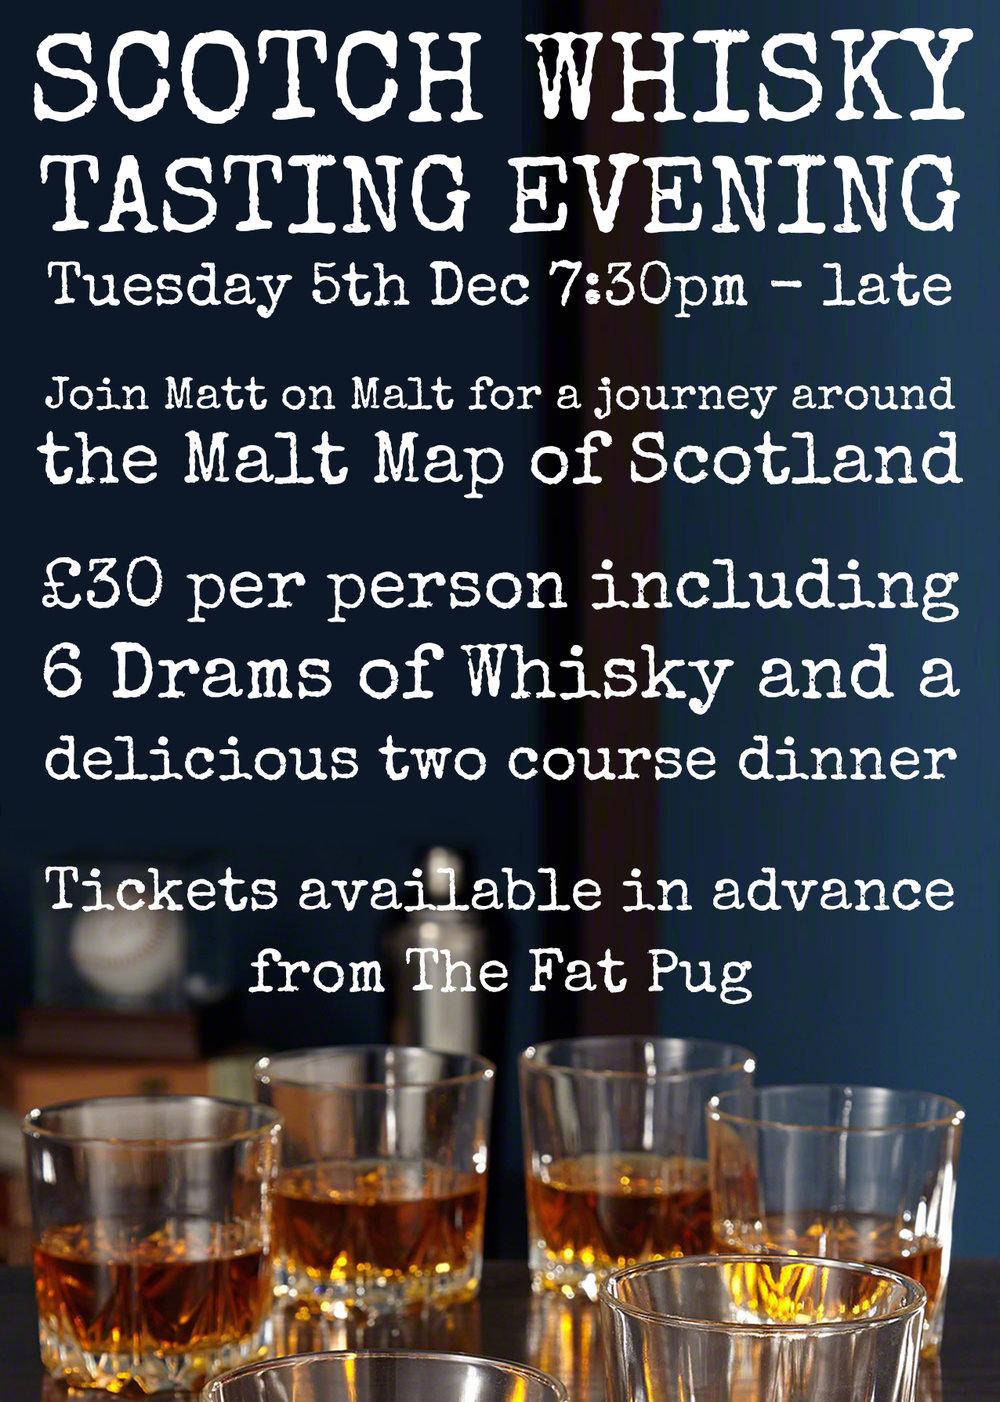 whisky event tfp 2 lr.jpg